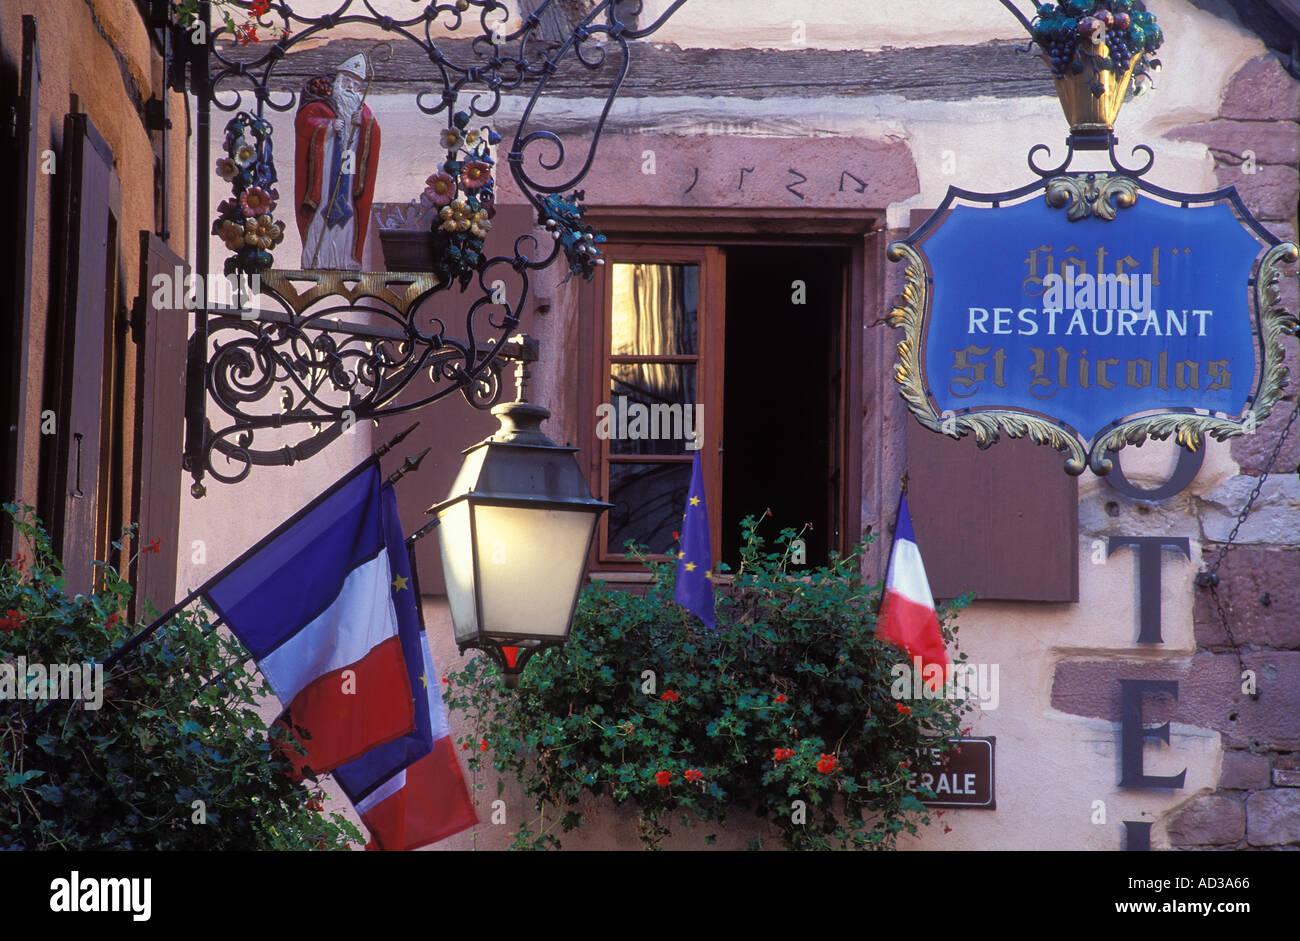 Hotel Restaurant St Nicolas Riquewihr Alsace France Stock